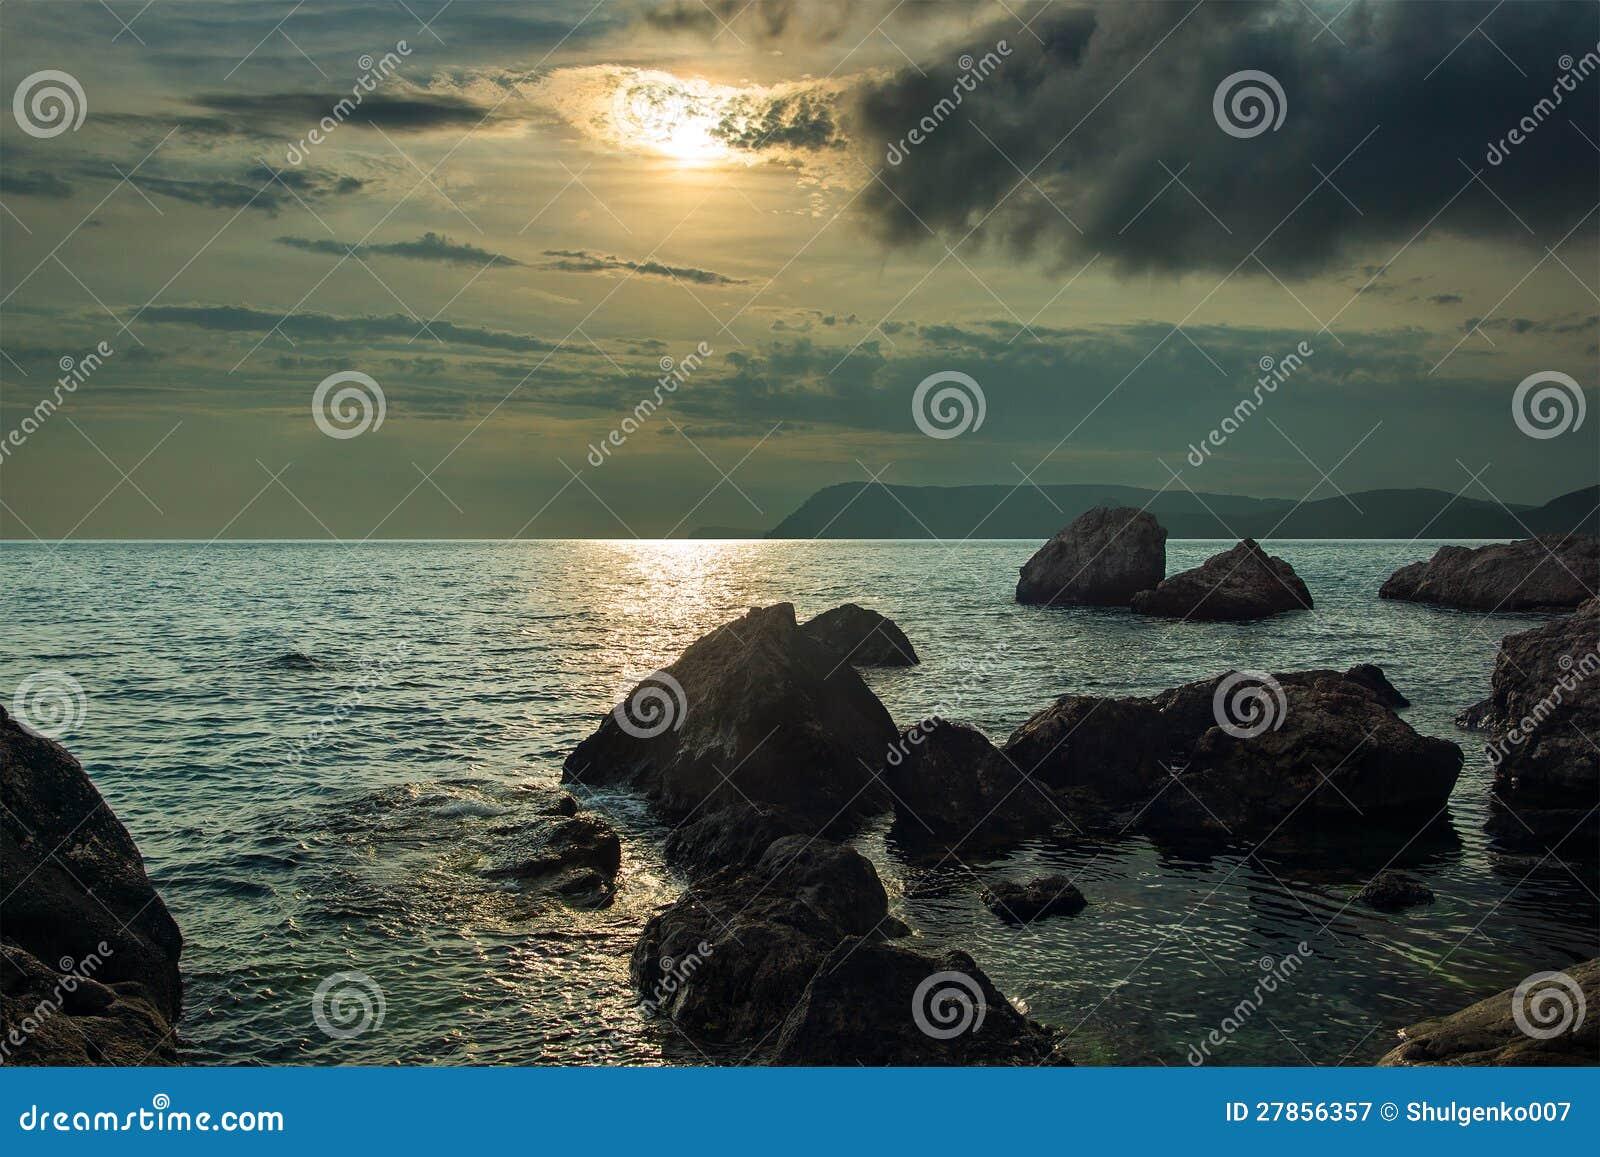 A beautiful calm sunset, on the Black Sea